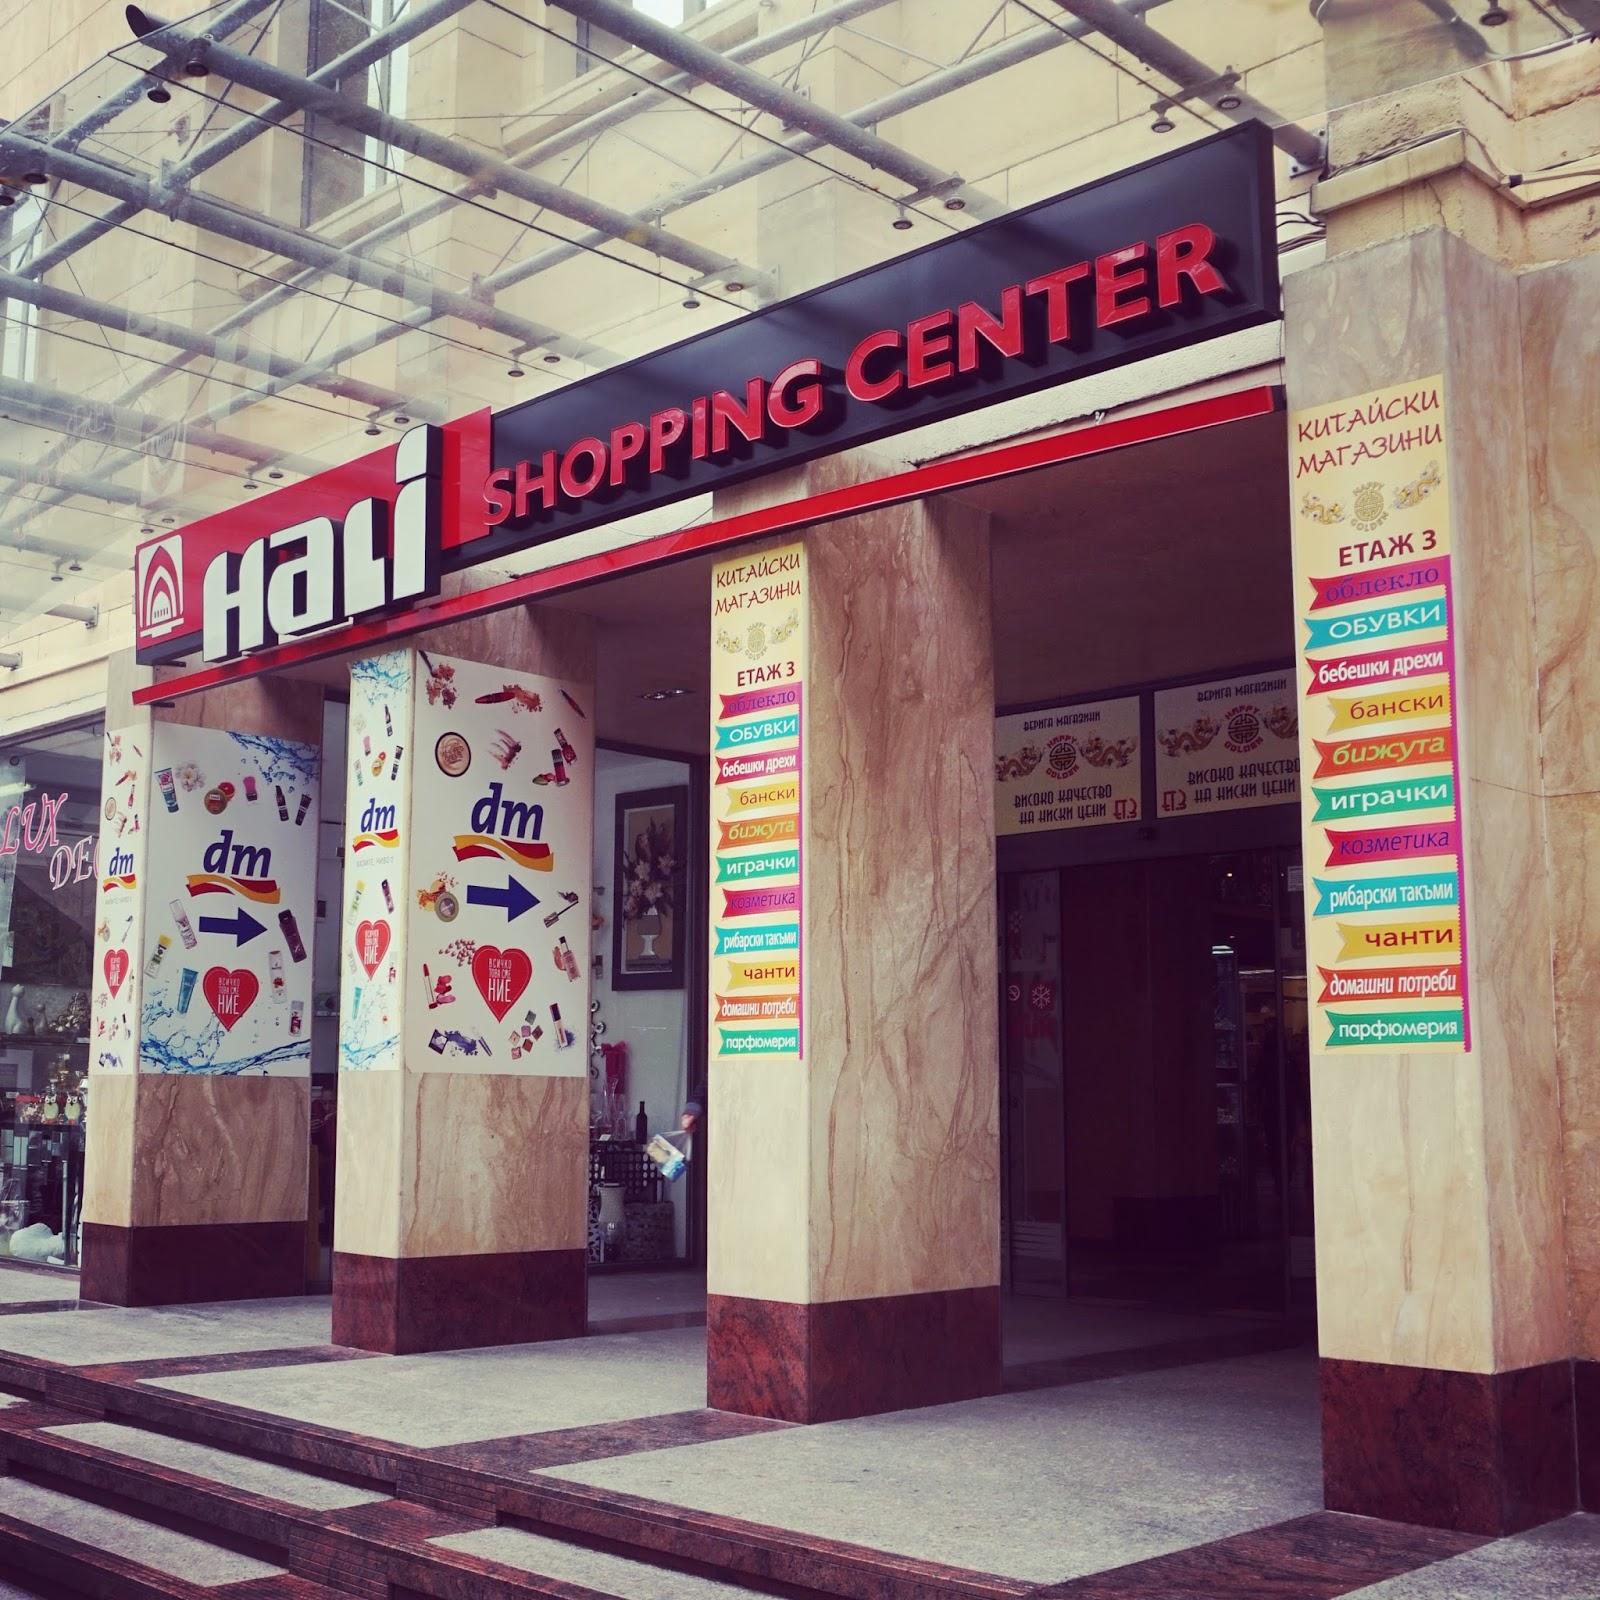 a3078587229a ... ψώνια και είσαι πελάτης με απαιτήσεις και τουπέ  Το Χάλι Σόπινγκ Σέντερ  στο κέντρο του Πλοβντιβ είναι το μολ των ονείρων σου. Θέλεις ρούχα  Στο  Χάλι! ...